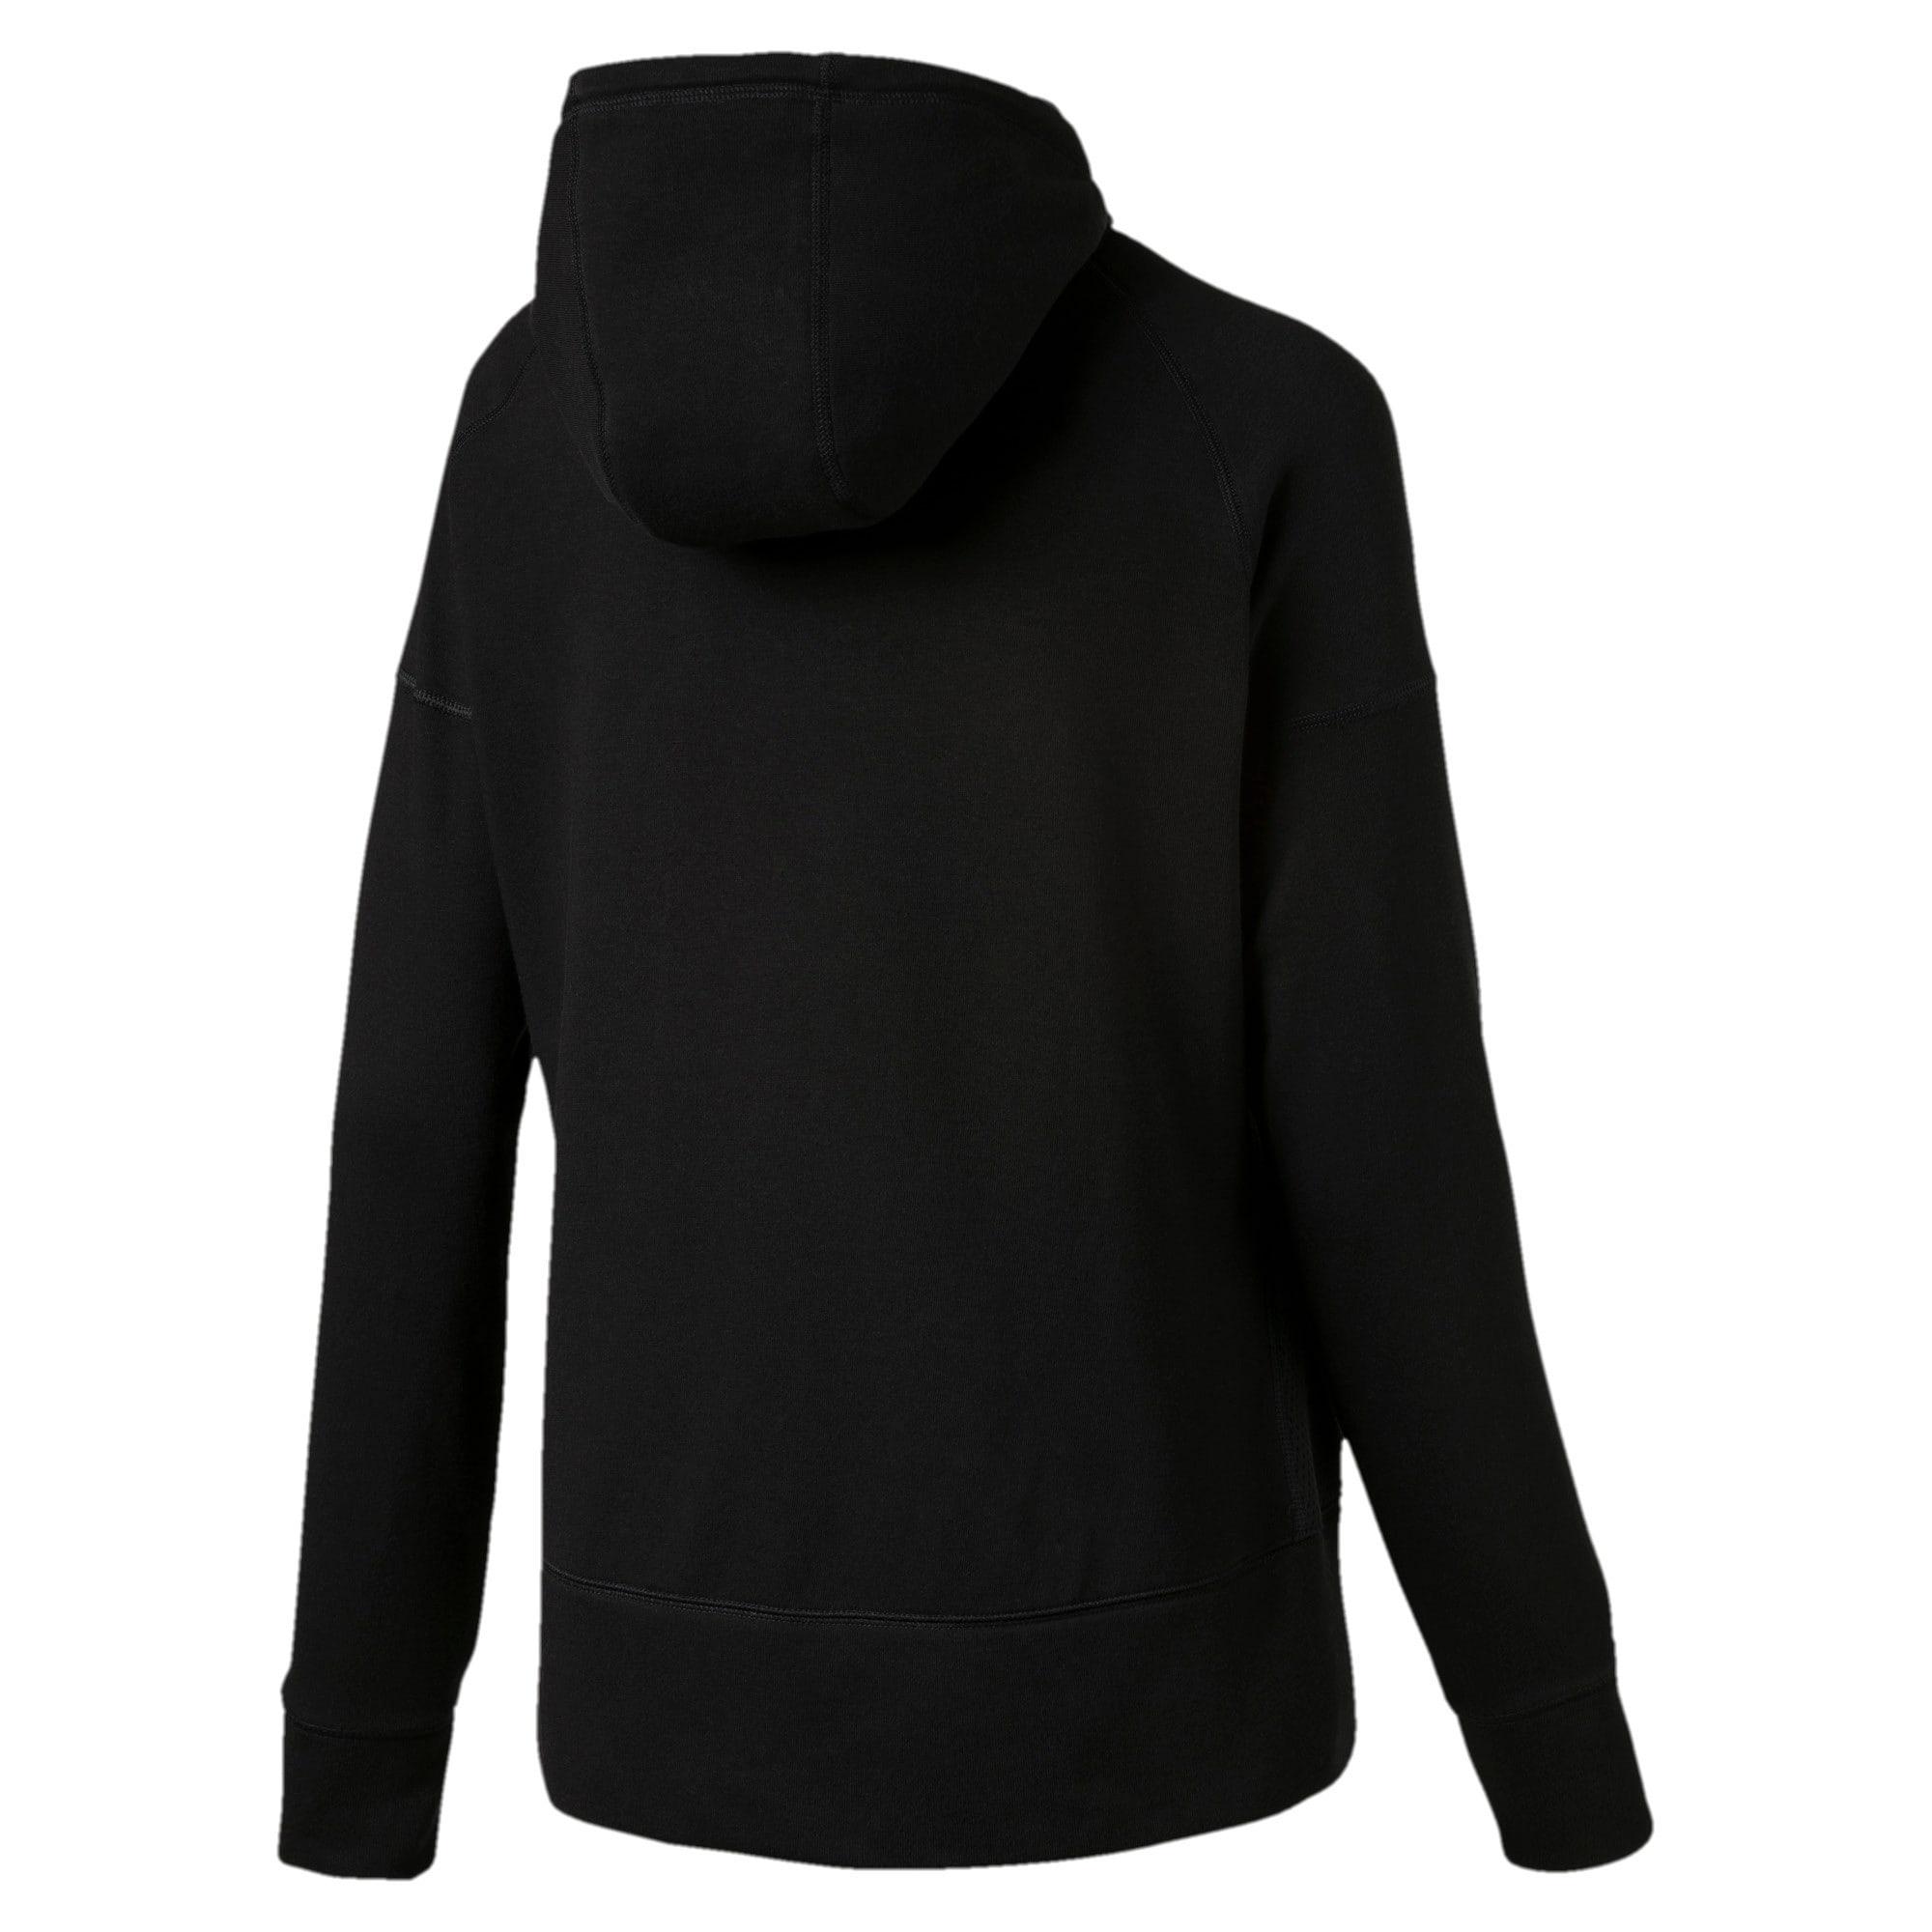 Thumbnail 5 of Yogini Knitted Full Zip Women's Track Jacket, Cotton Black, medium-IND